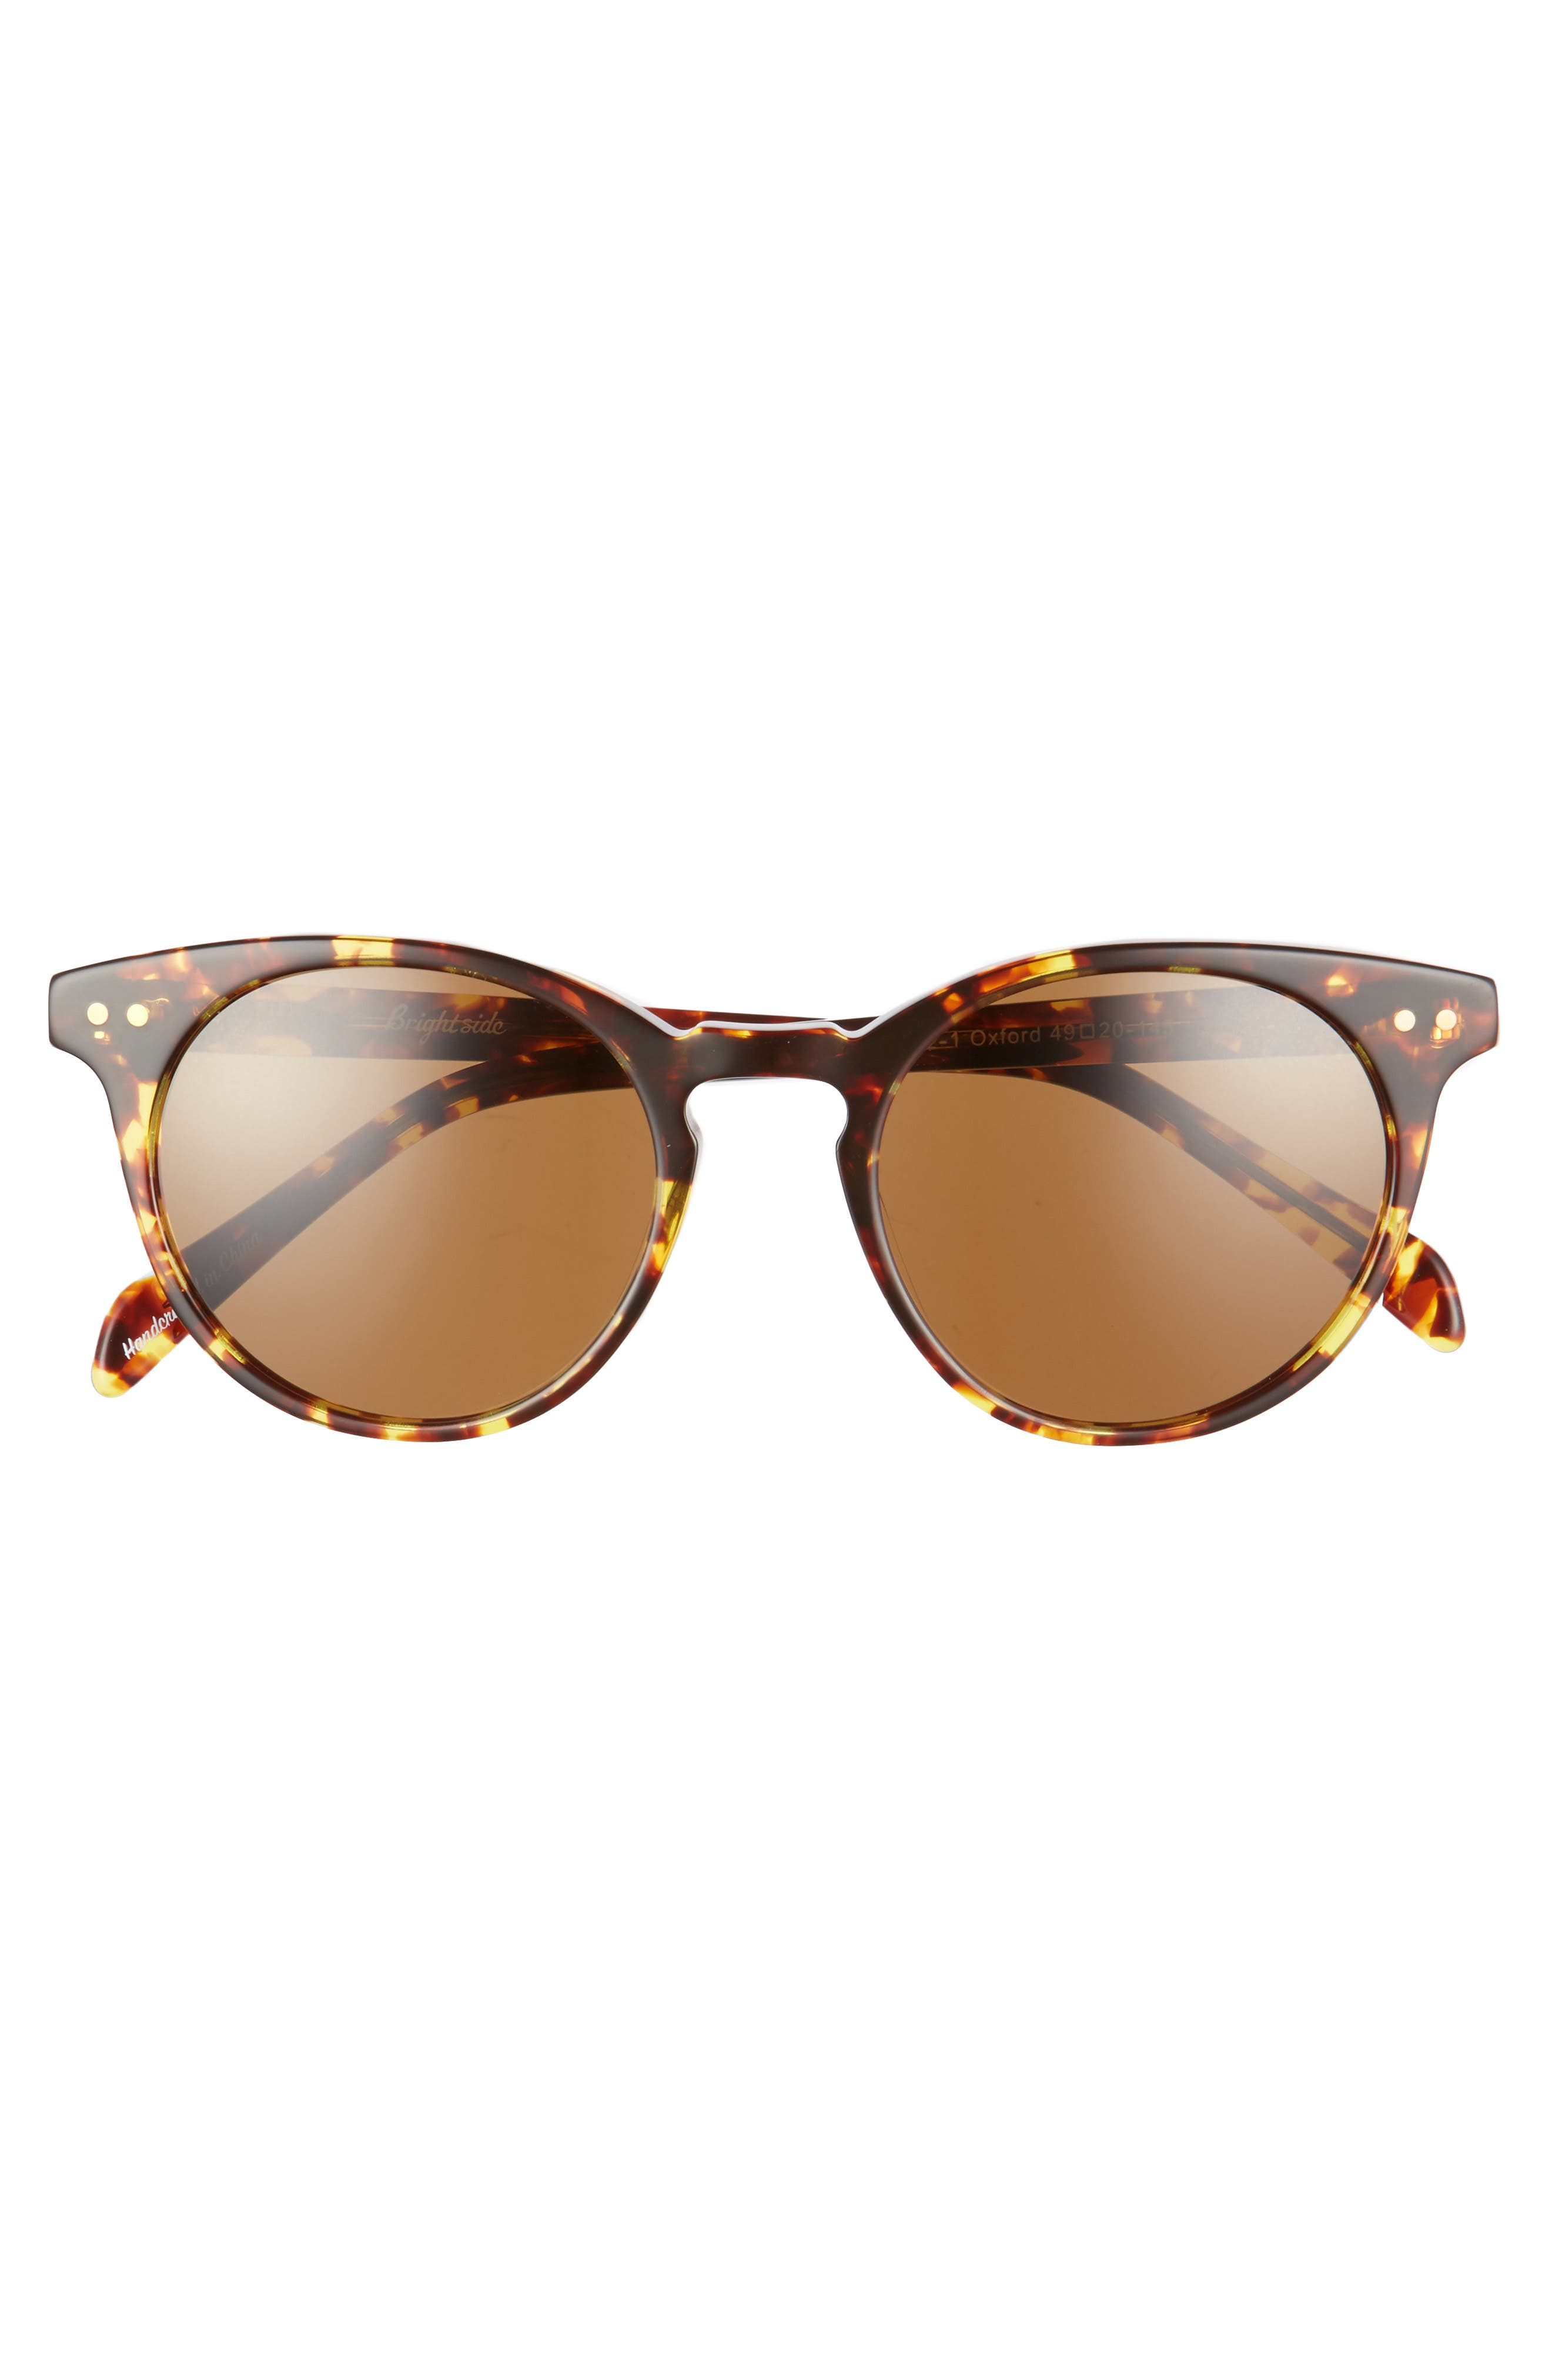 Oxford 49mm Sunglasses,                             Alternate thumbnail 3, color,                             Classic Tortoise/ Brown